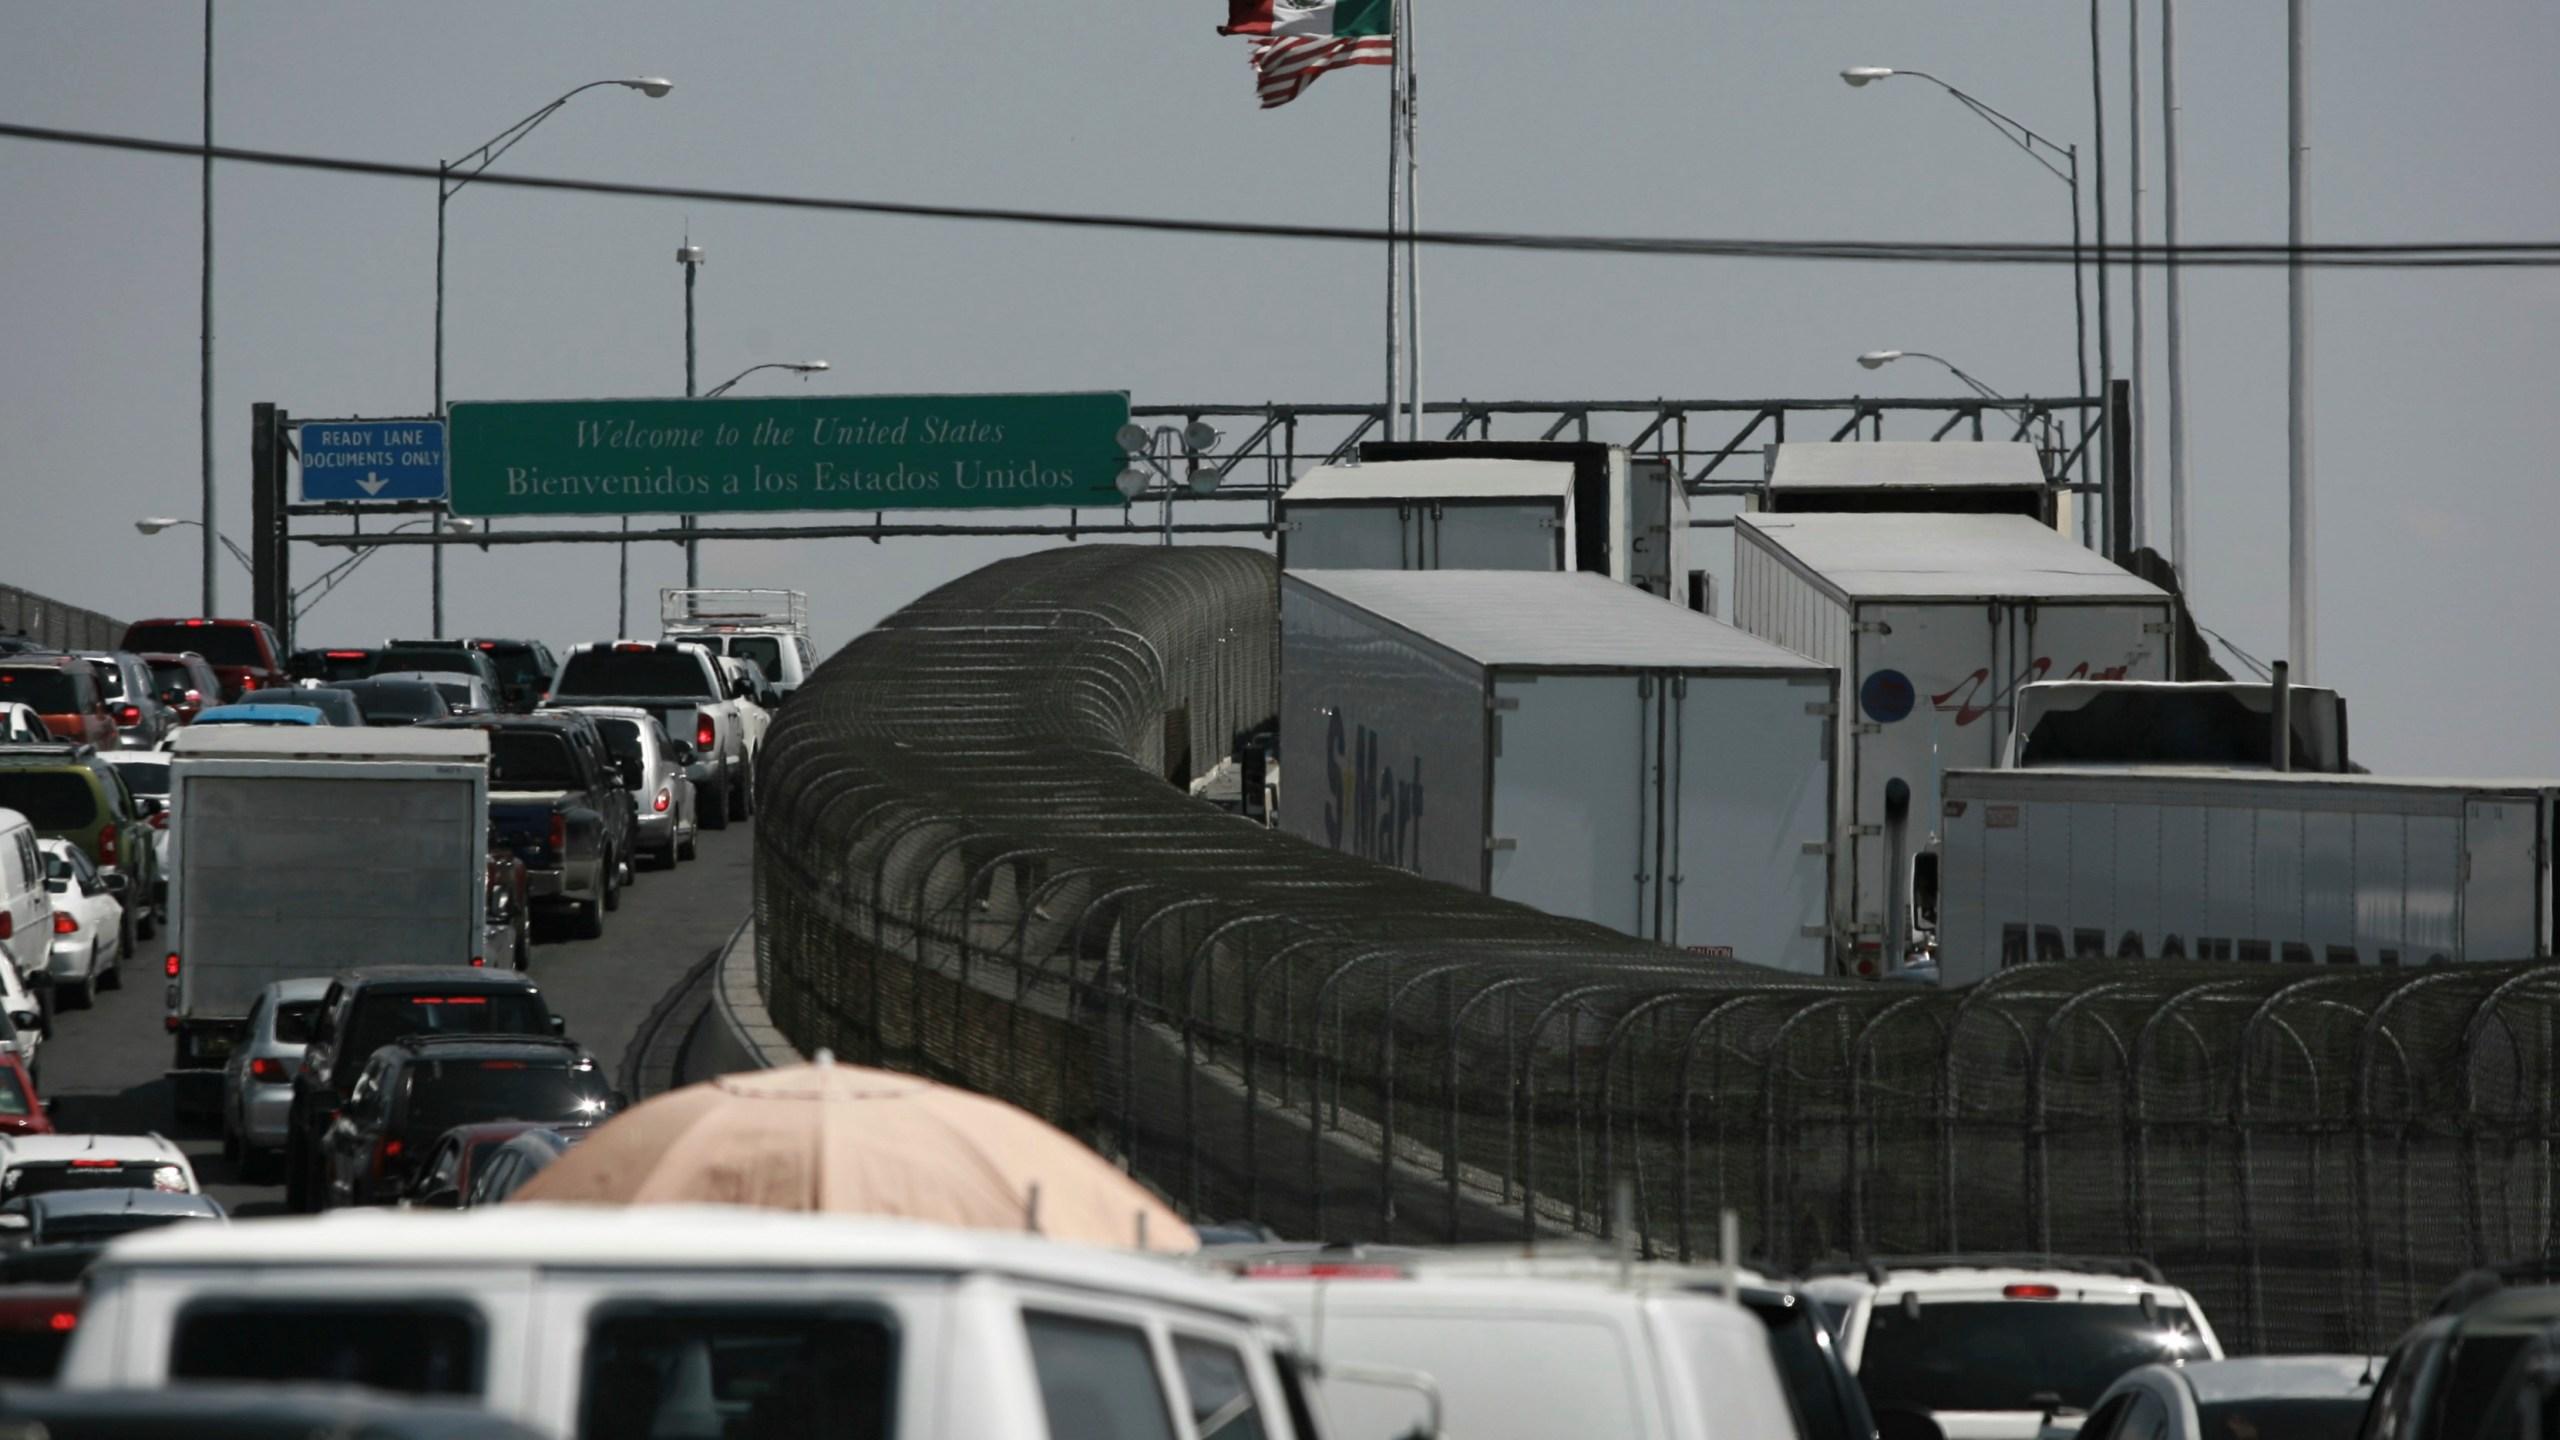 Mexico_US_Tariffs_73237-159532.jpg11459704